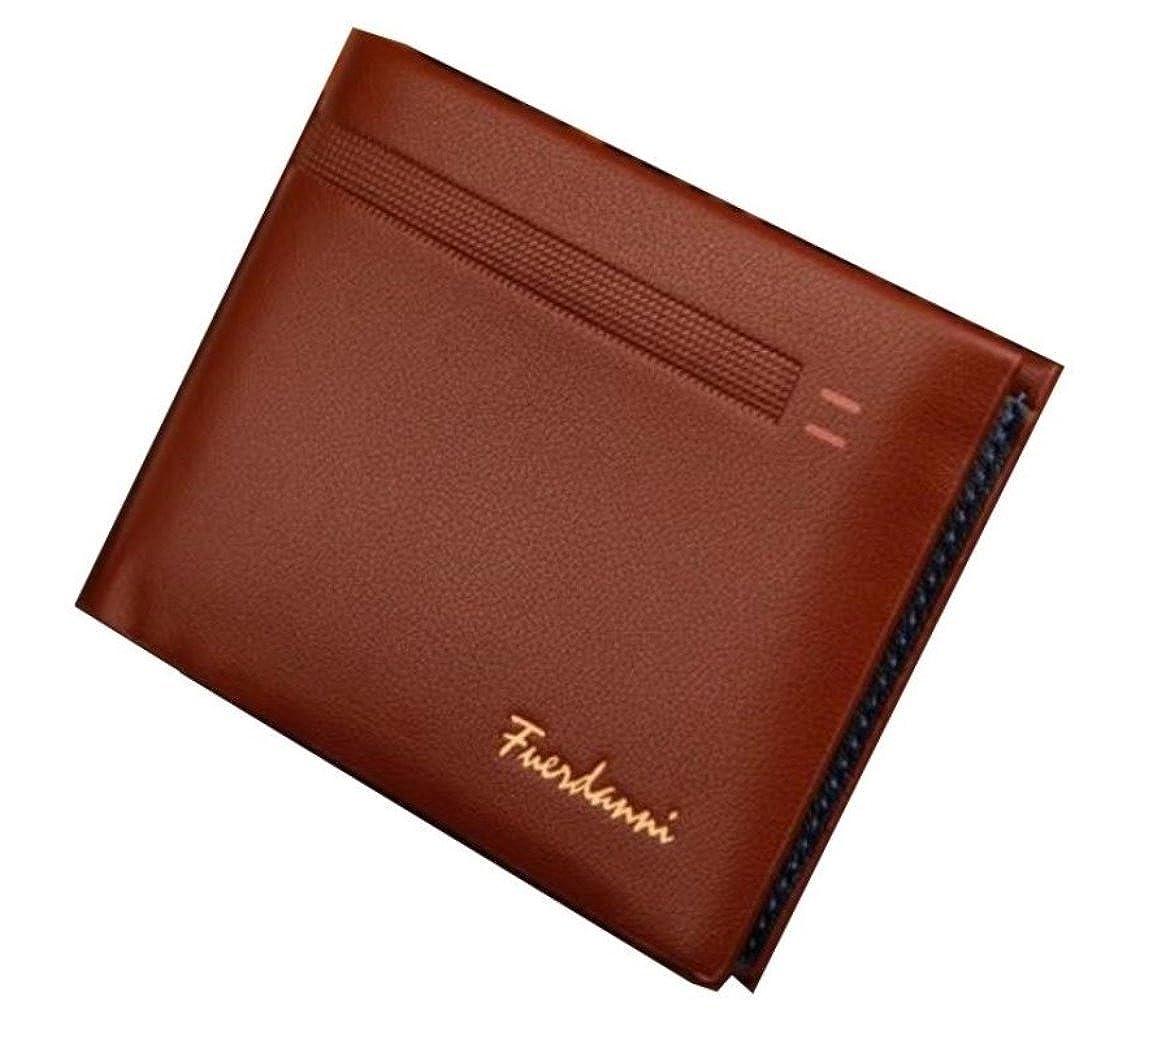 99a64dd51702 DSANTECH Men's Genuine Leather Wallet Fuerdanni One size Black at ...